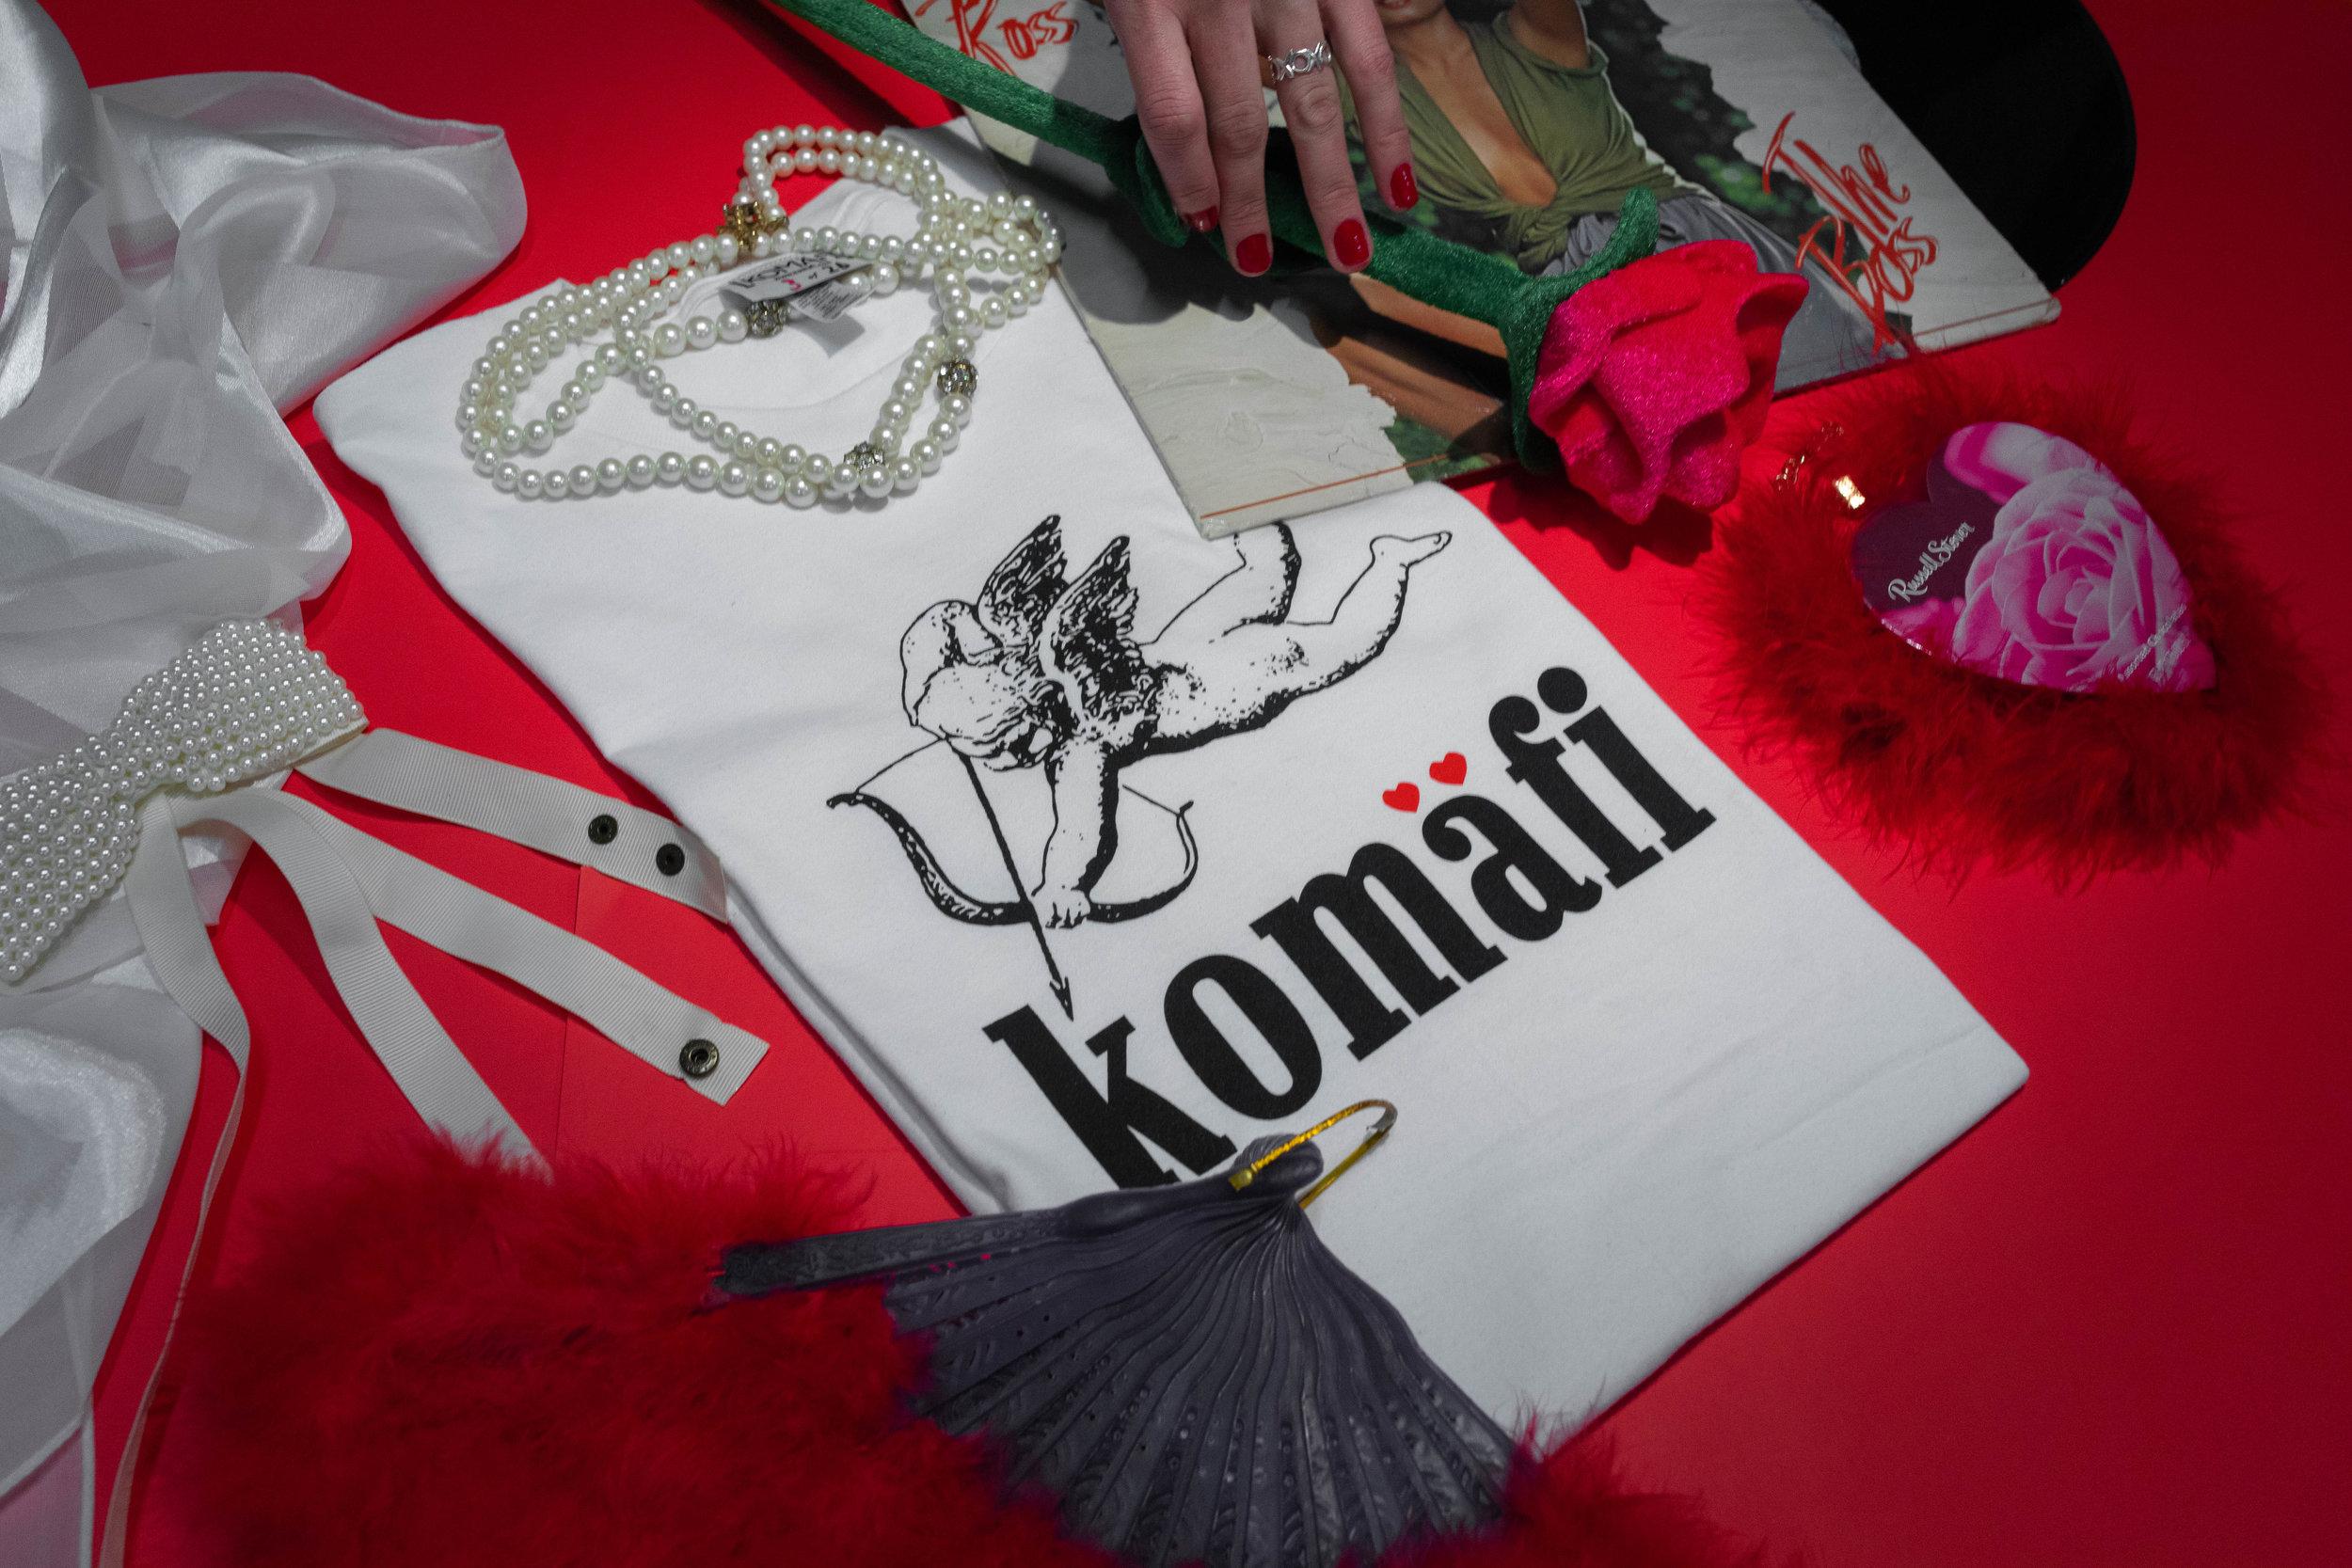 2019-02-12 Komafi (8 of 30).jpg